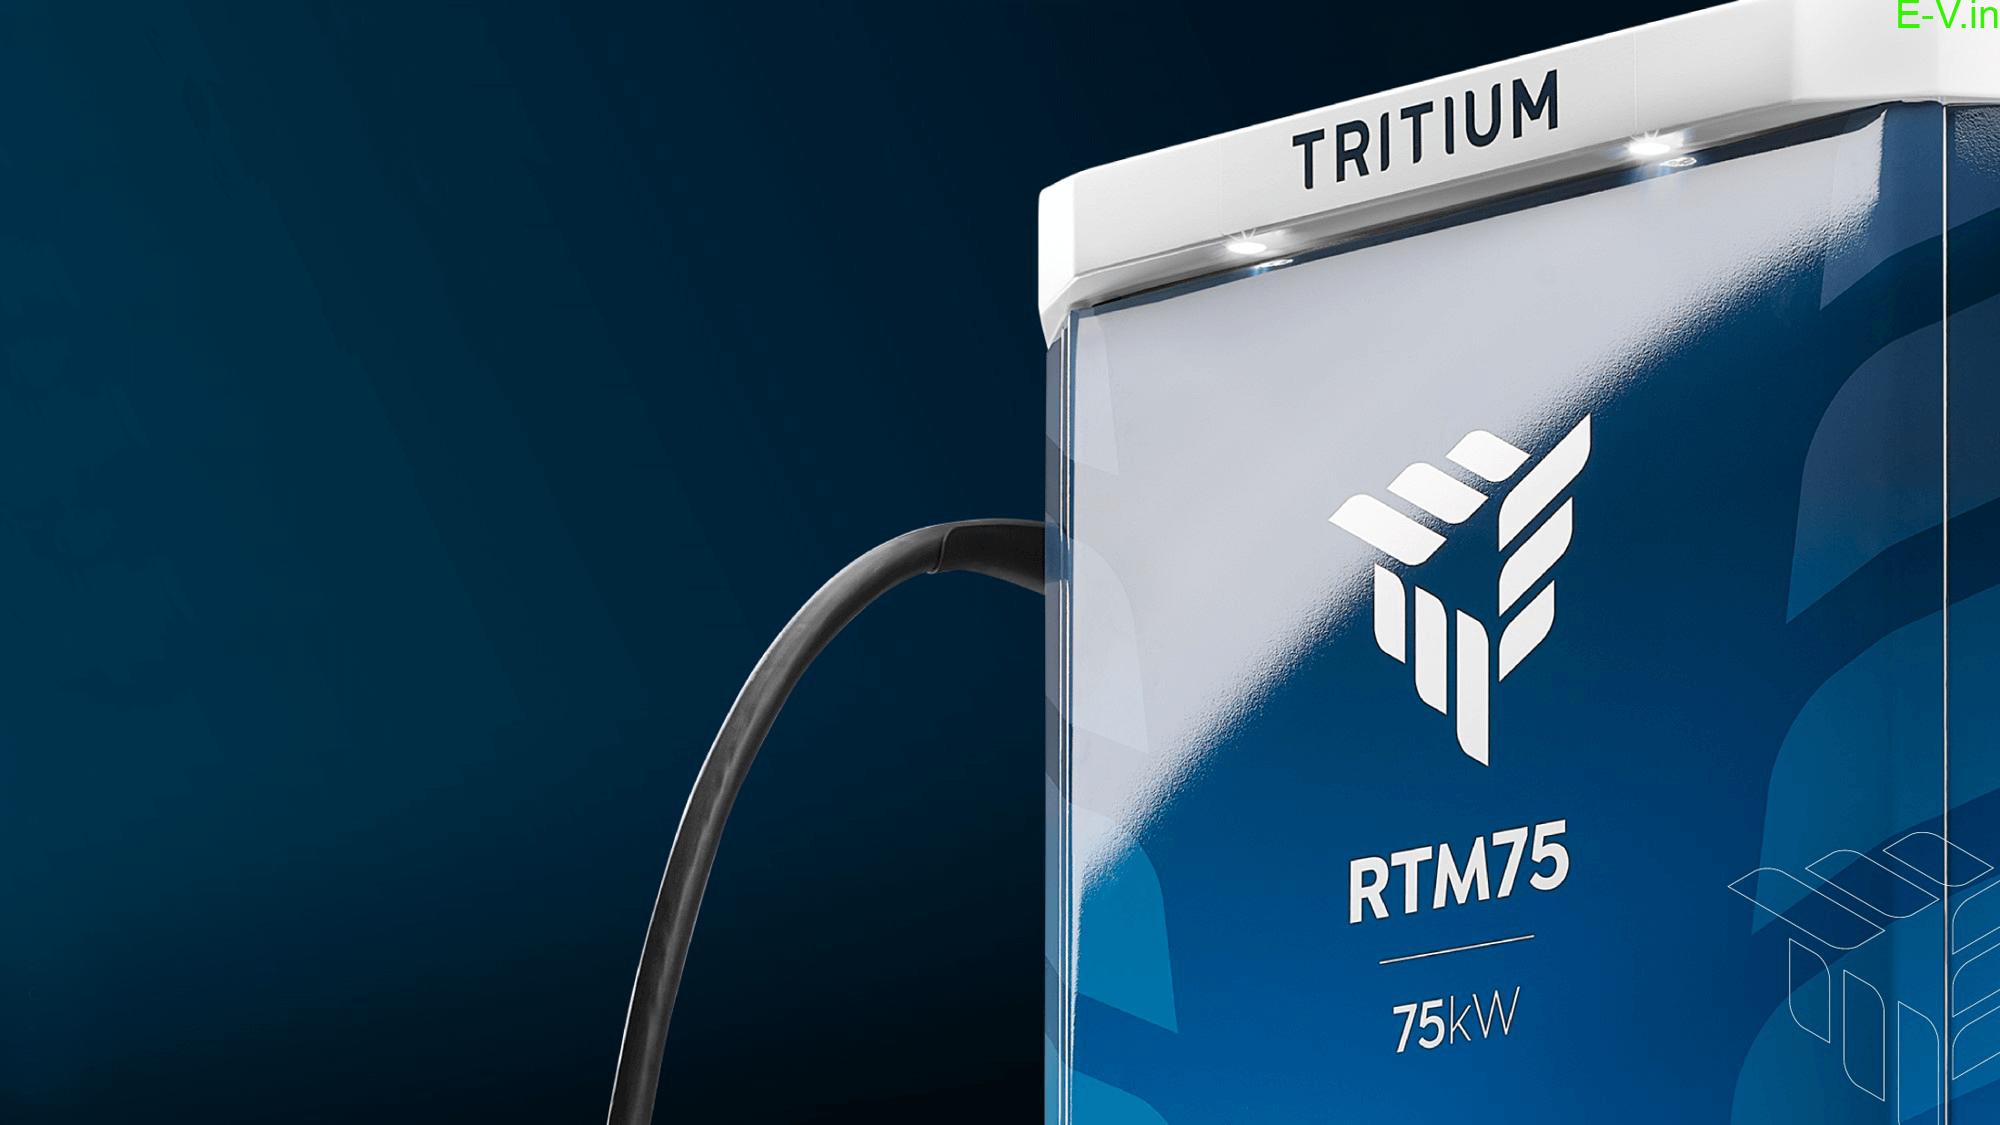 Tritium partners Solcon Industries